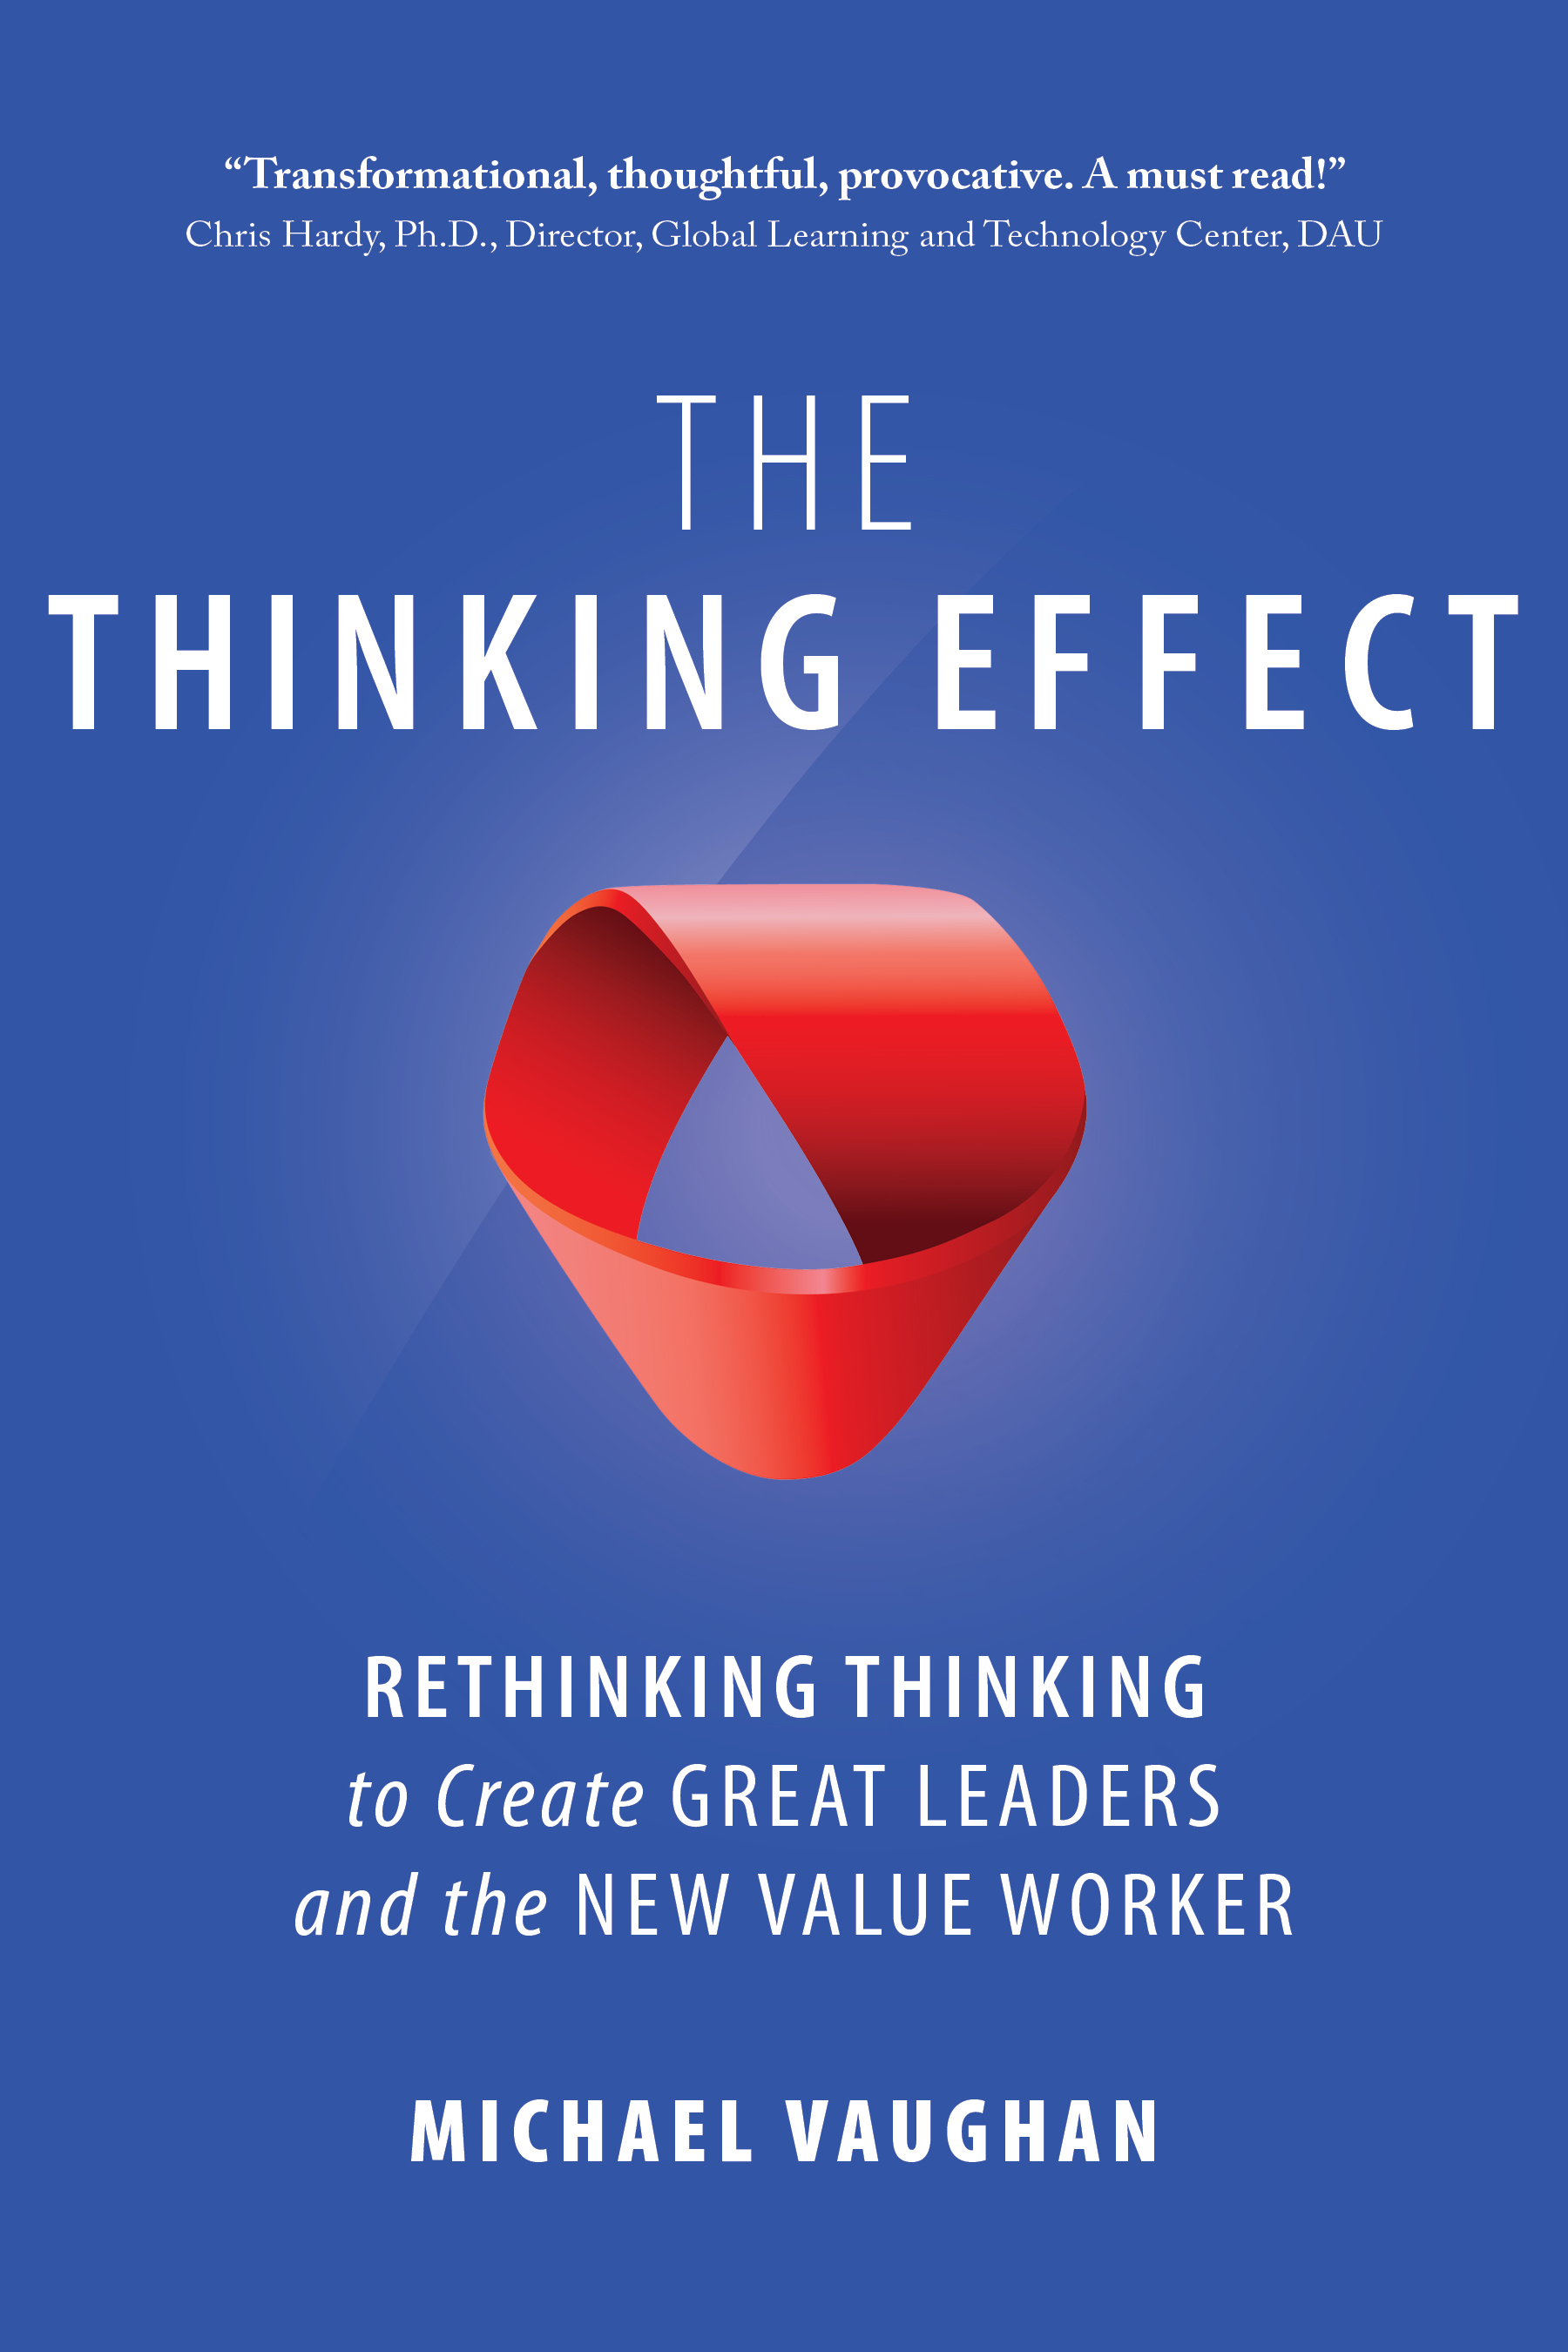 ThinkingEffect_FrontCover.jpg